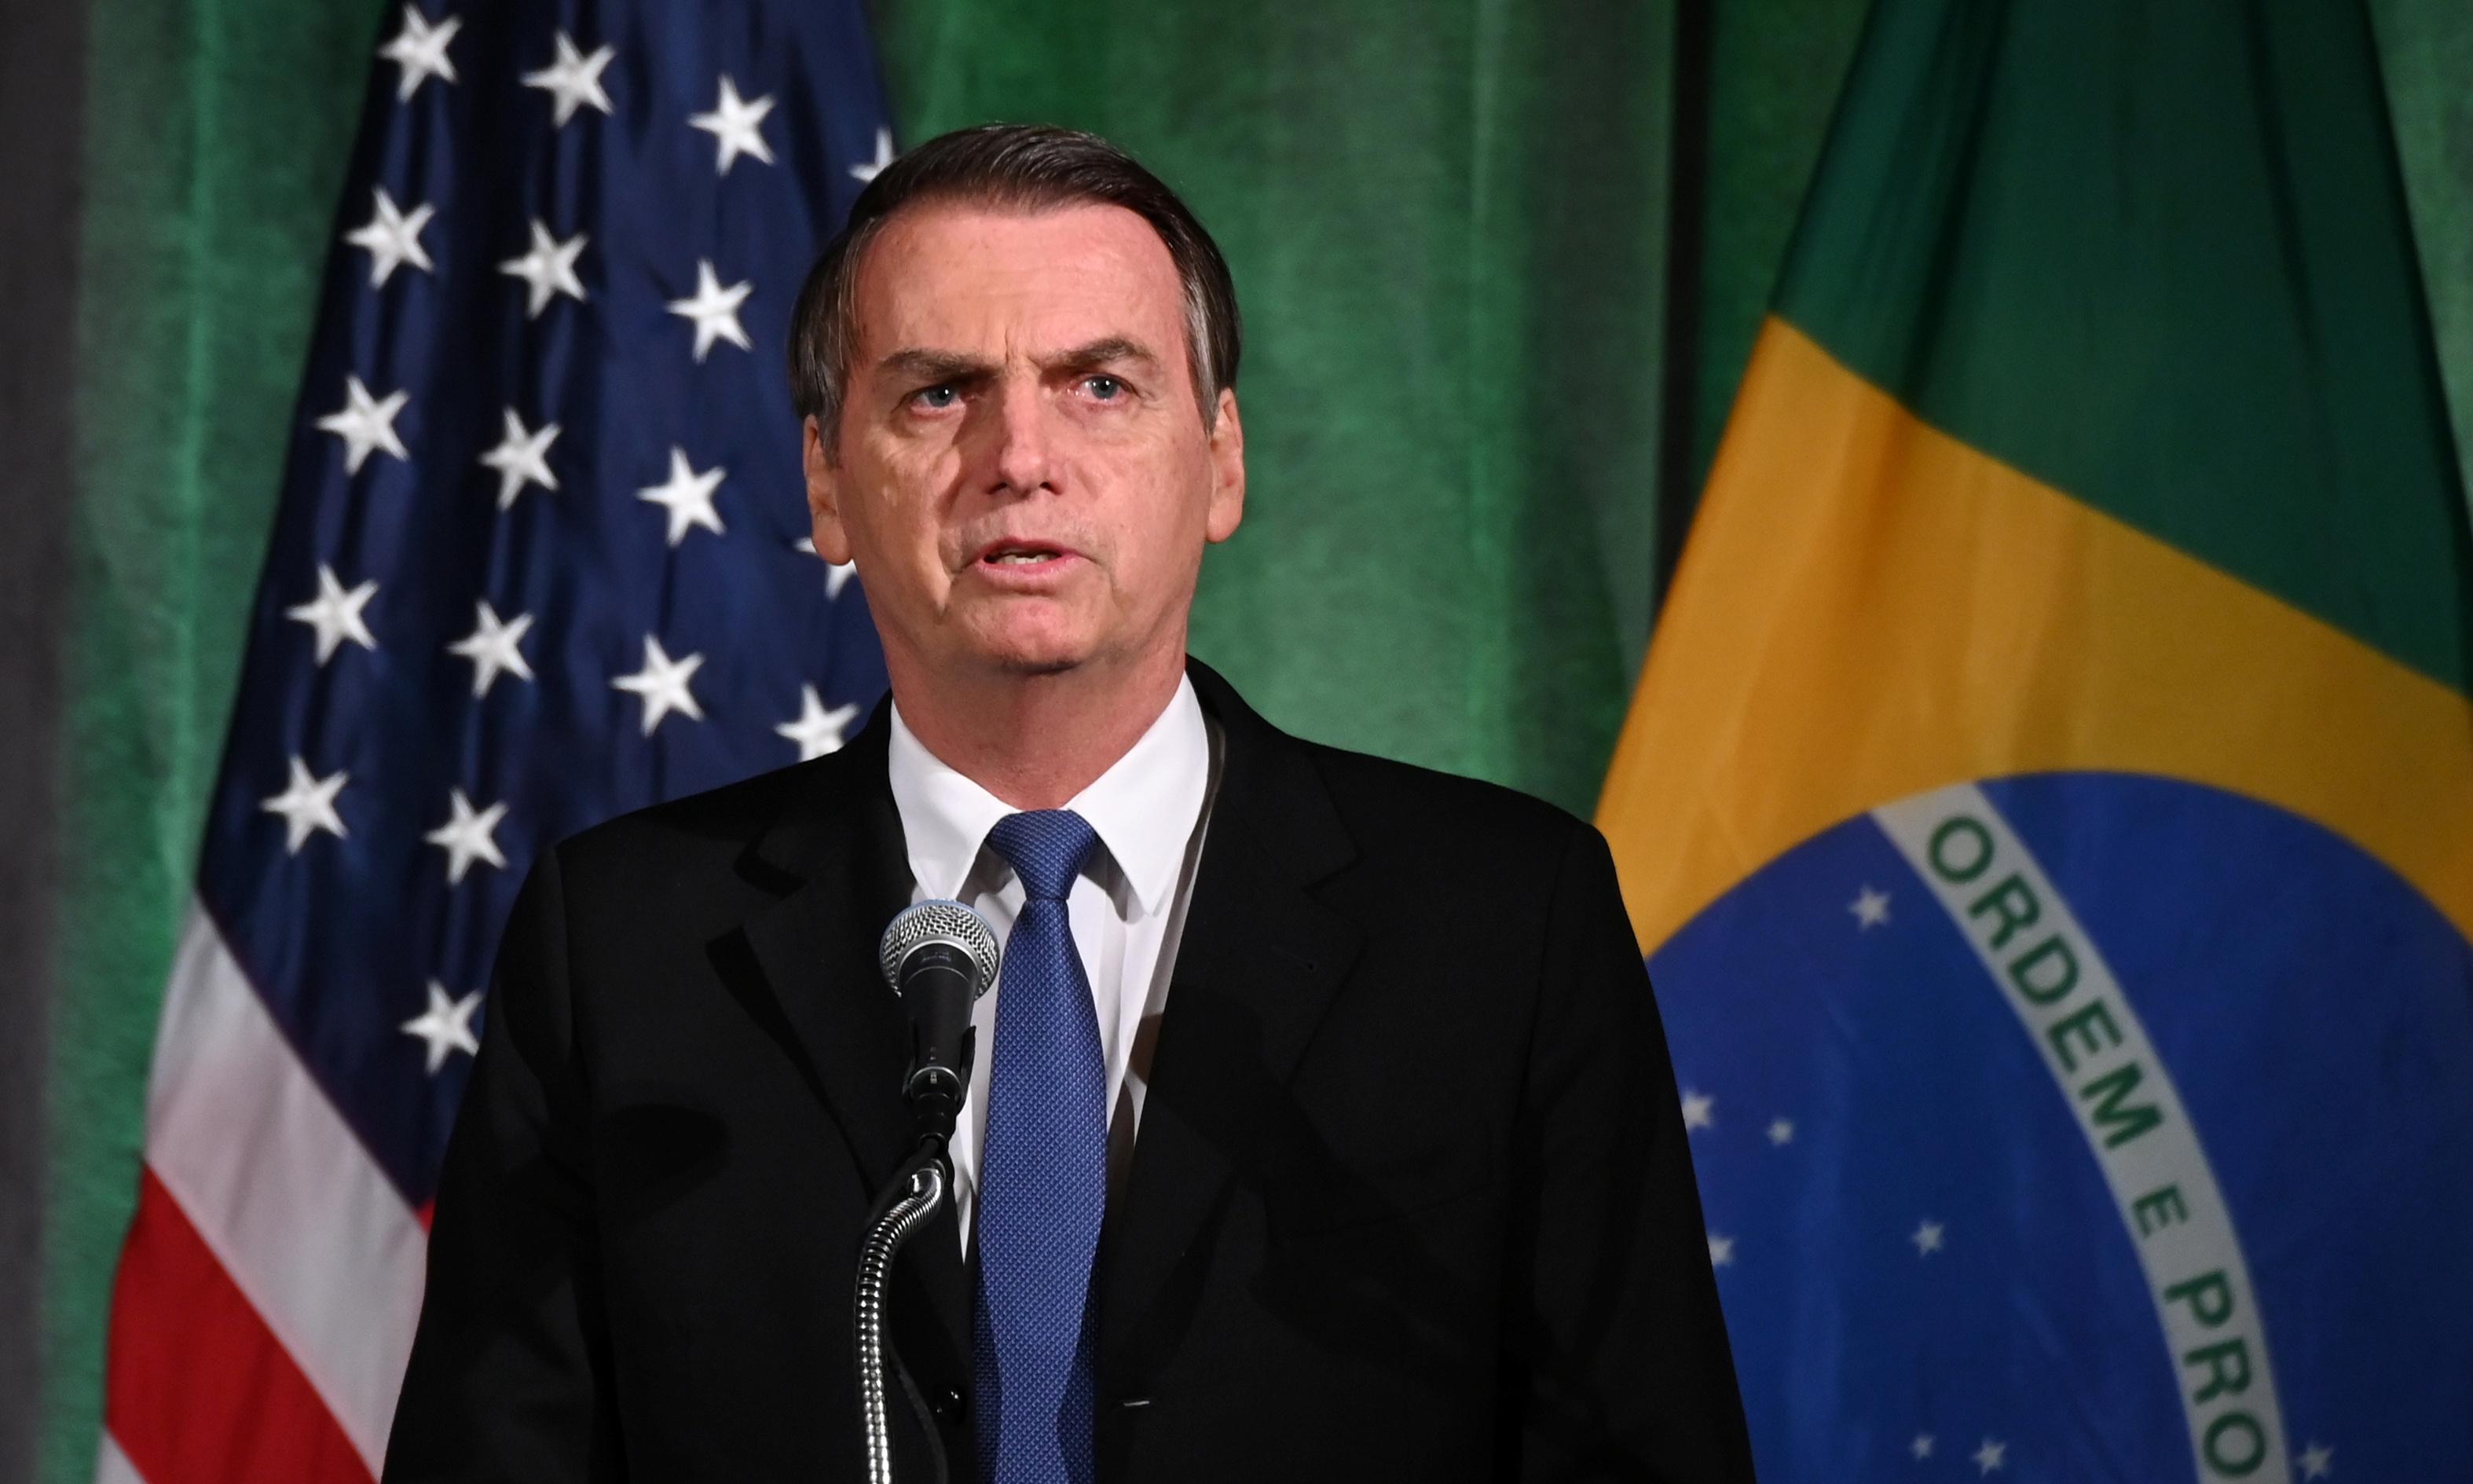 Jair Bolsonaro backs Trump's border wall ahead of White House meeting